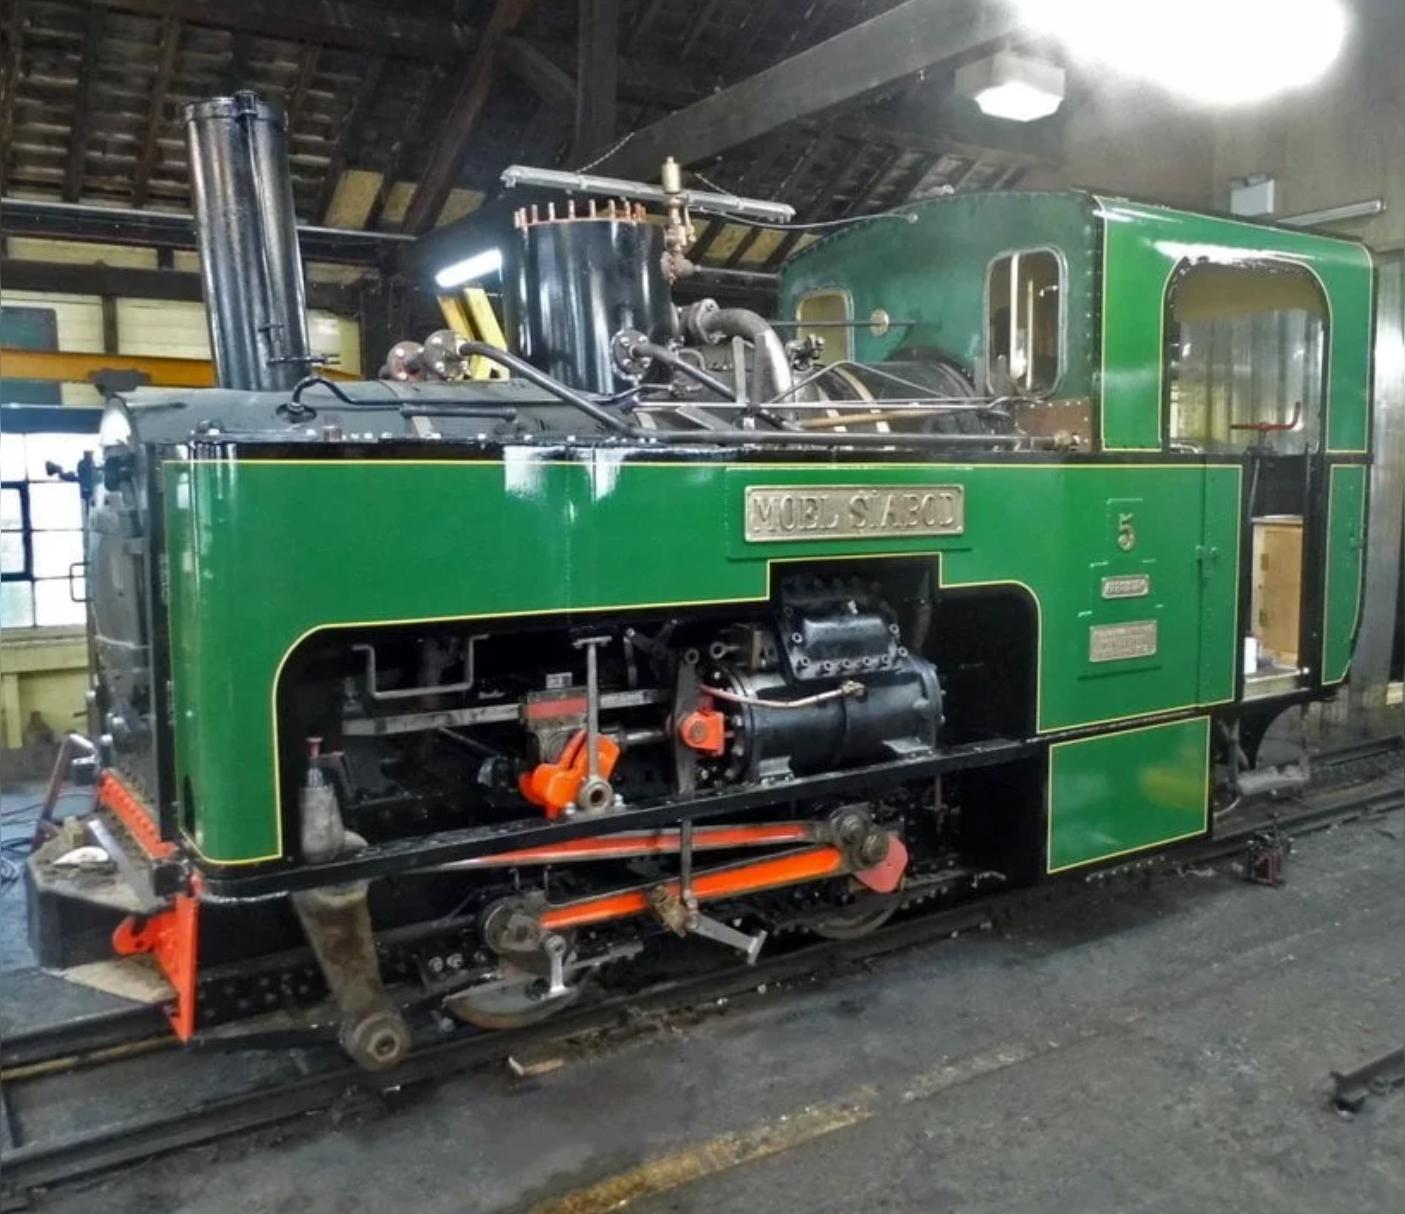 Moel Siabod | Thomas the Tank Engine Wikia | FANDOM powered by Wikia